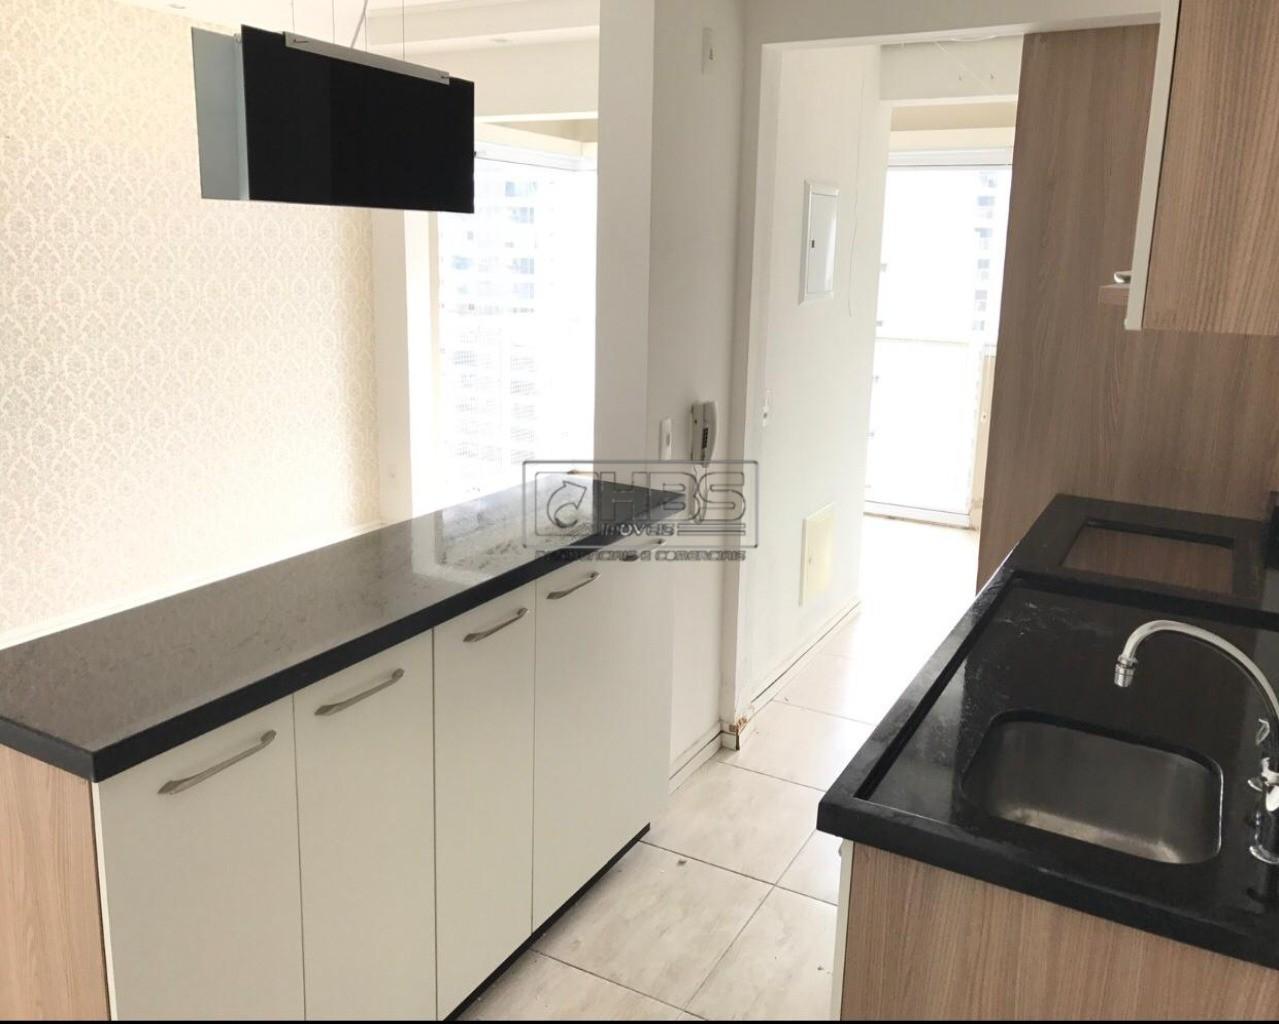 apartamento, morumbi, s& 227 o paulo sp, 60 m2 - local do imovel classificados